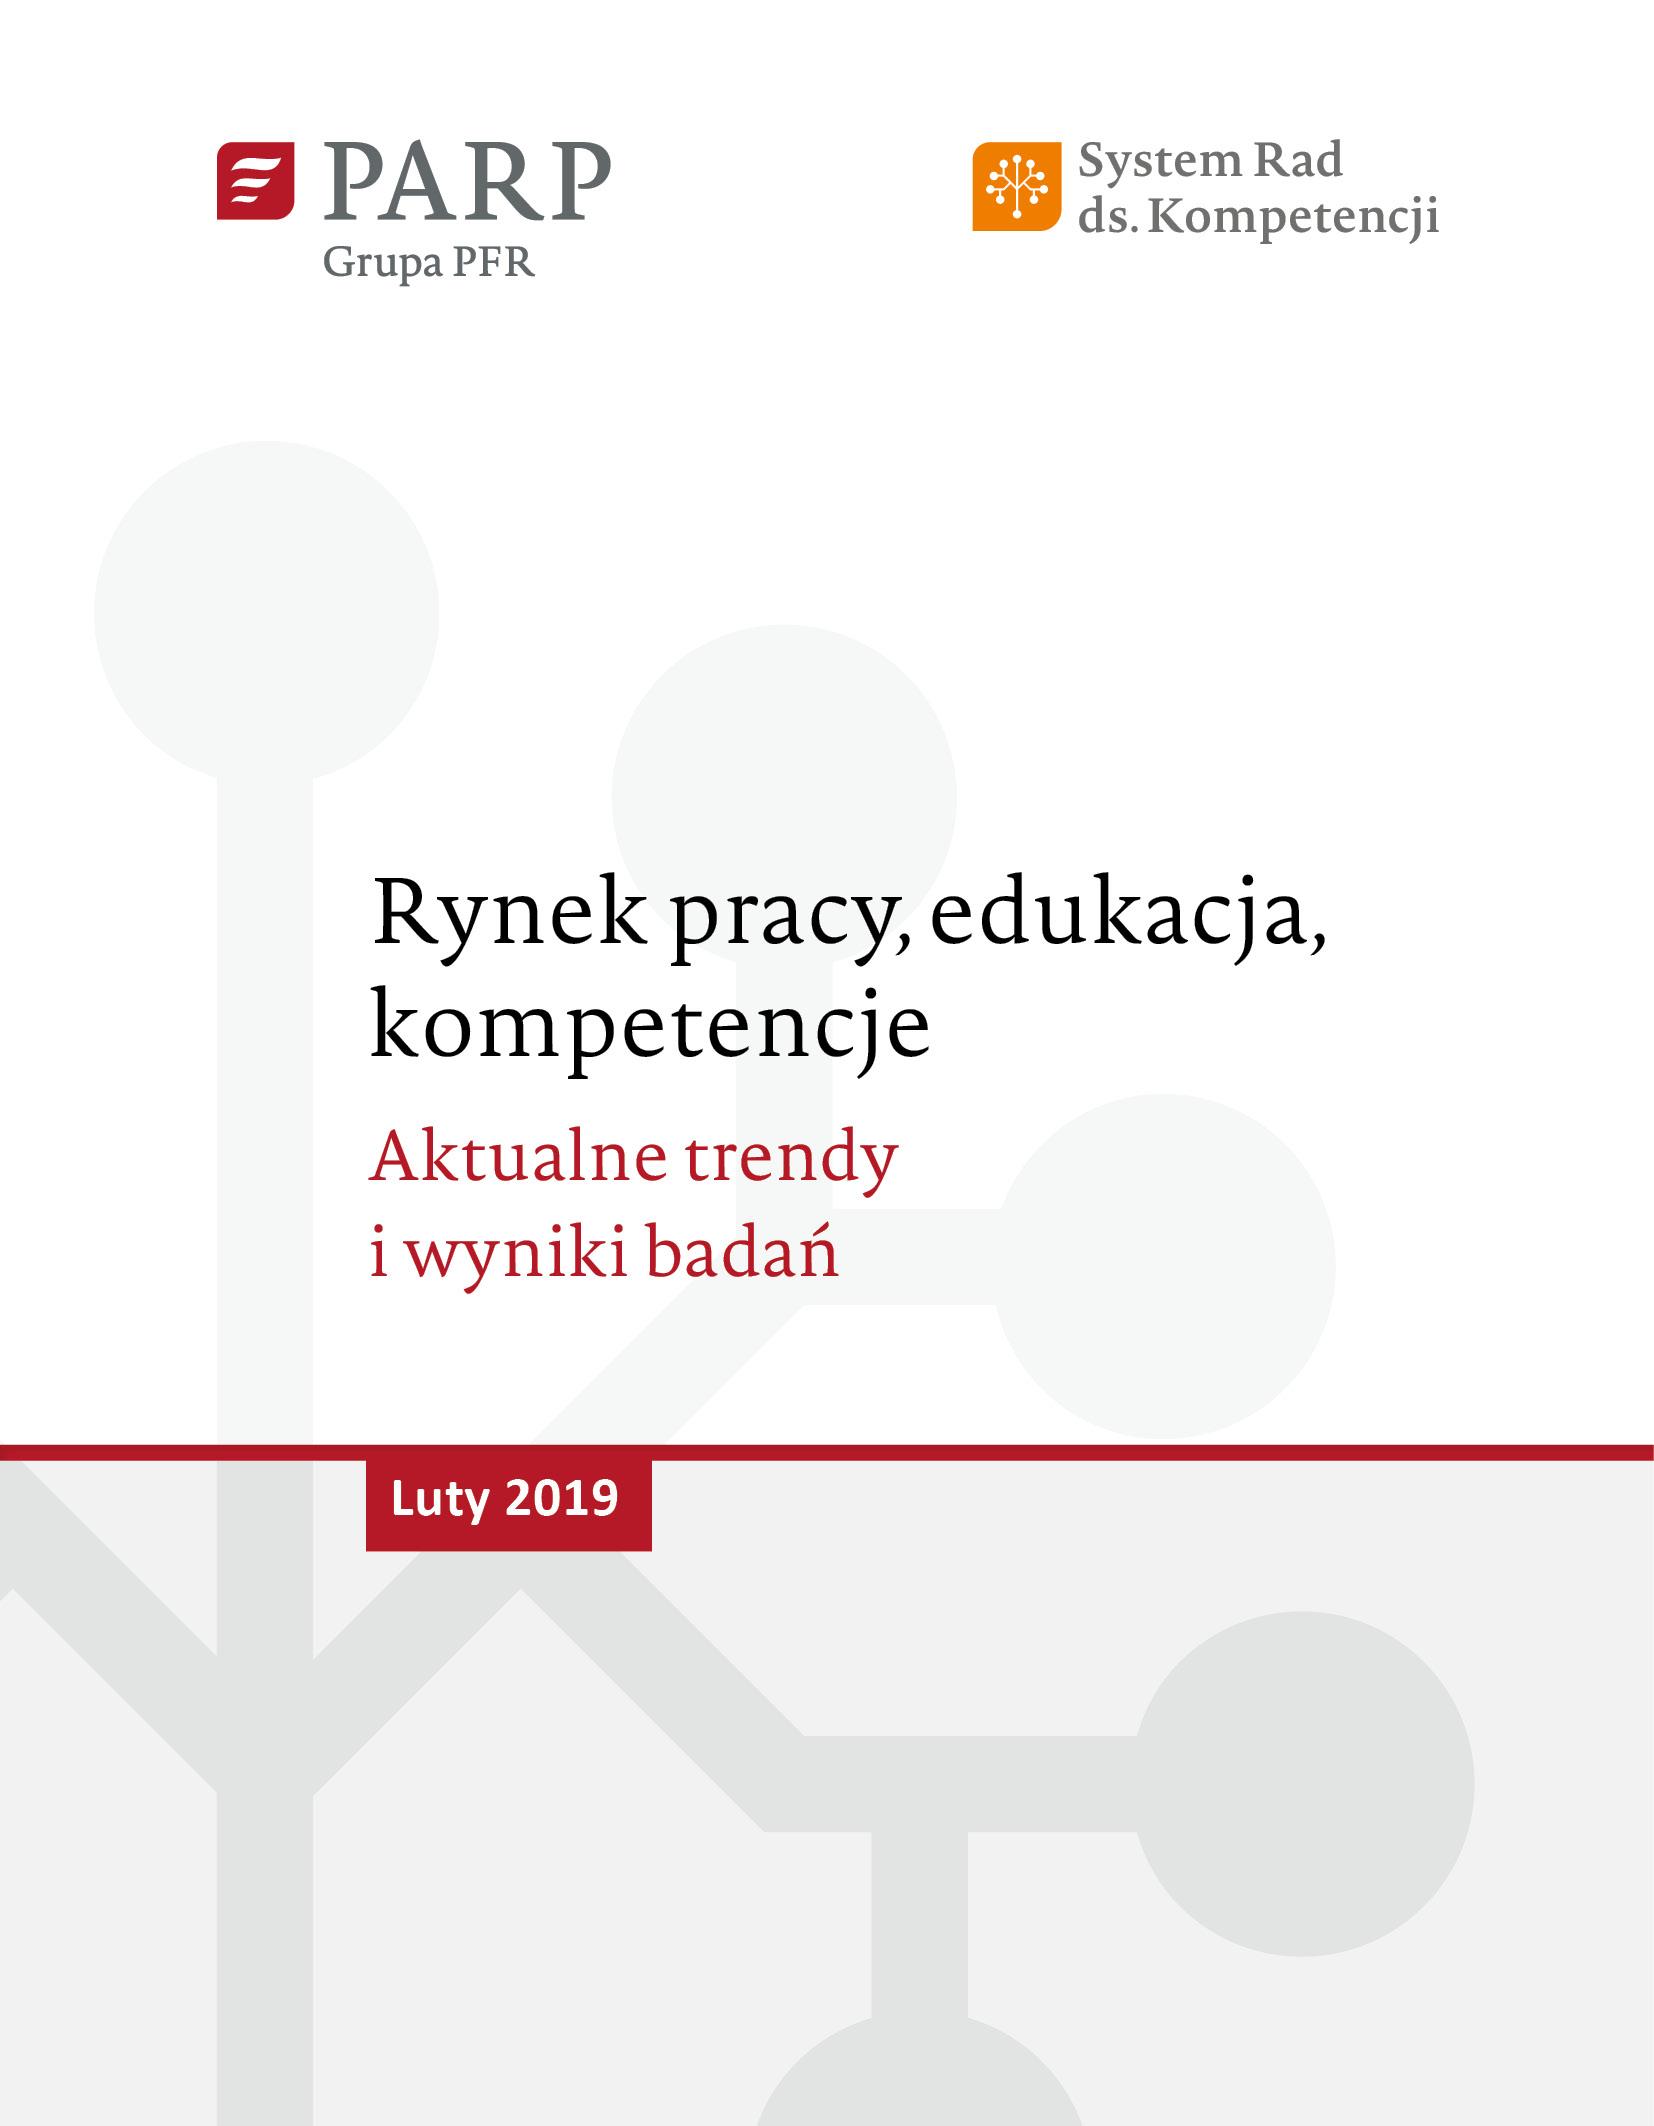 Rynek pracy, edukacja, kompetencje - luty 2019